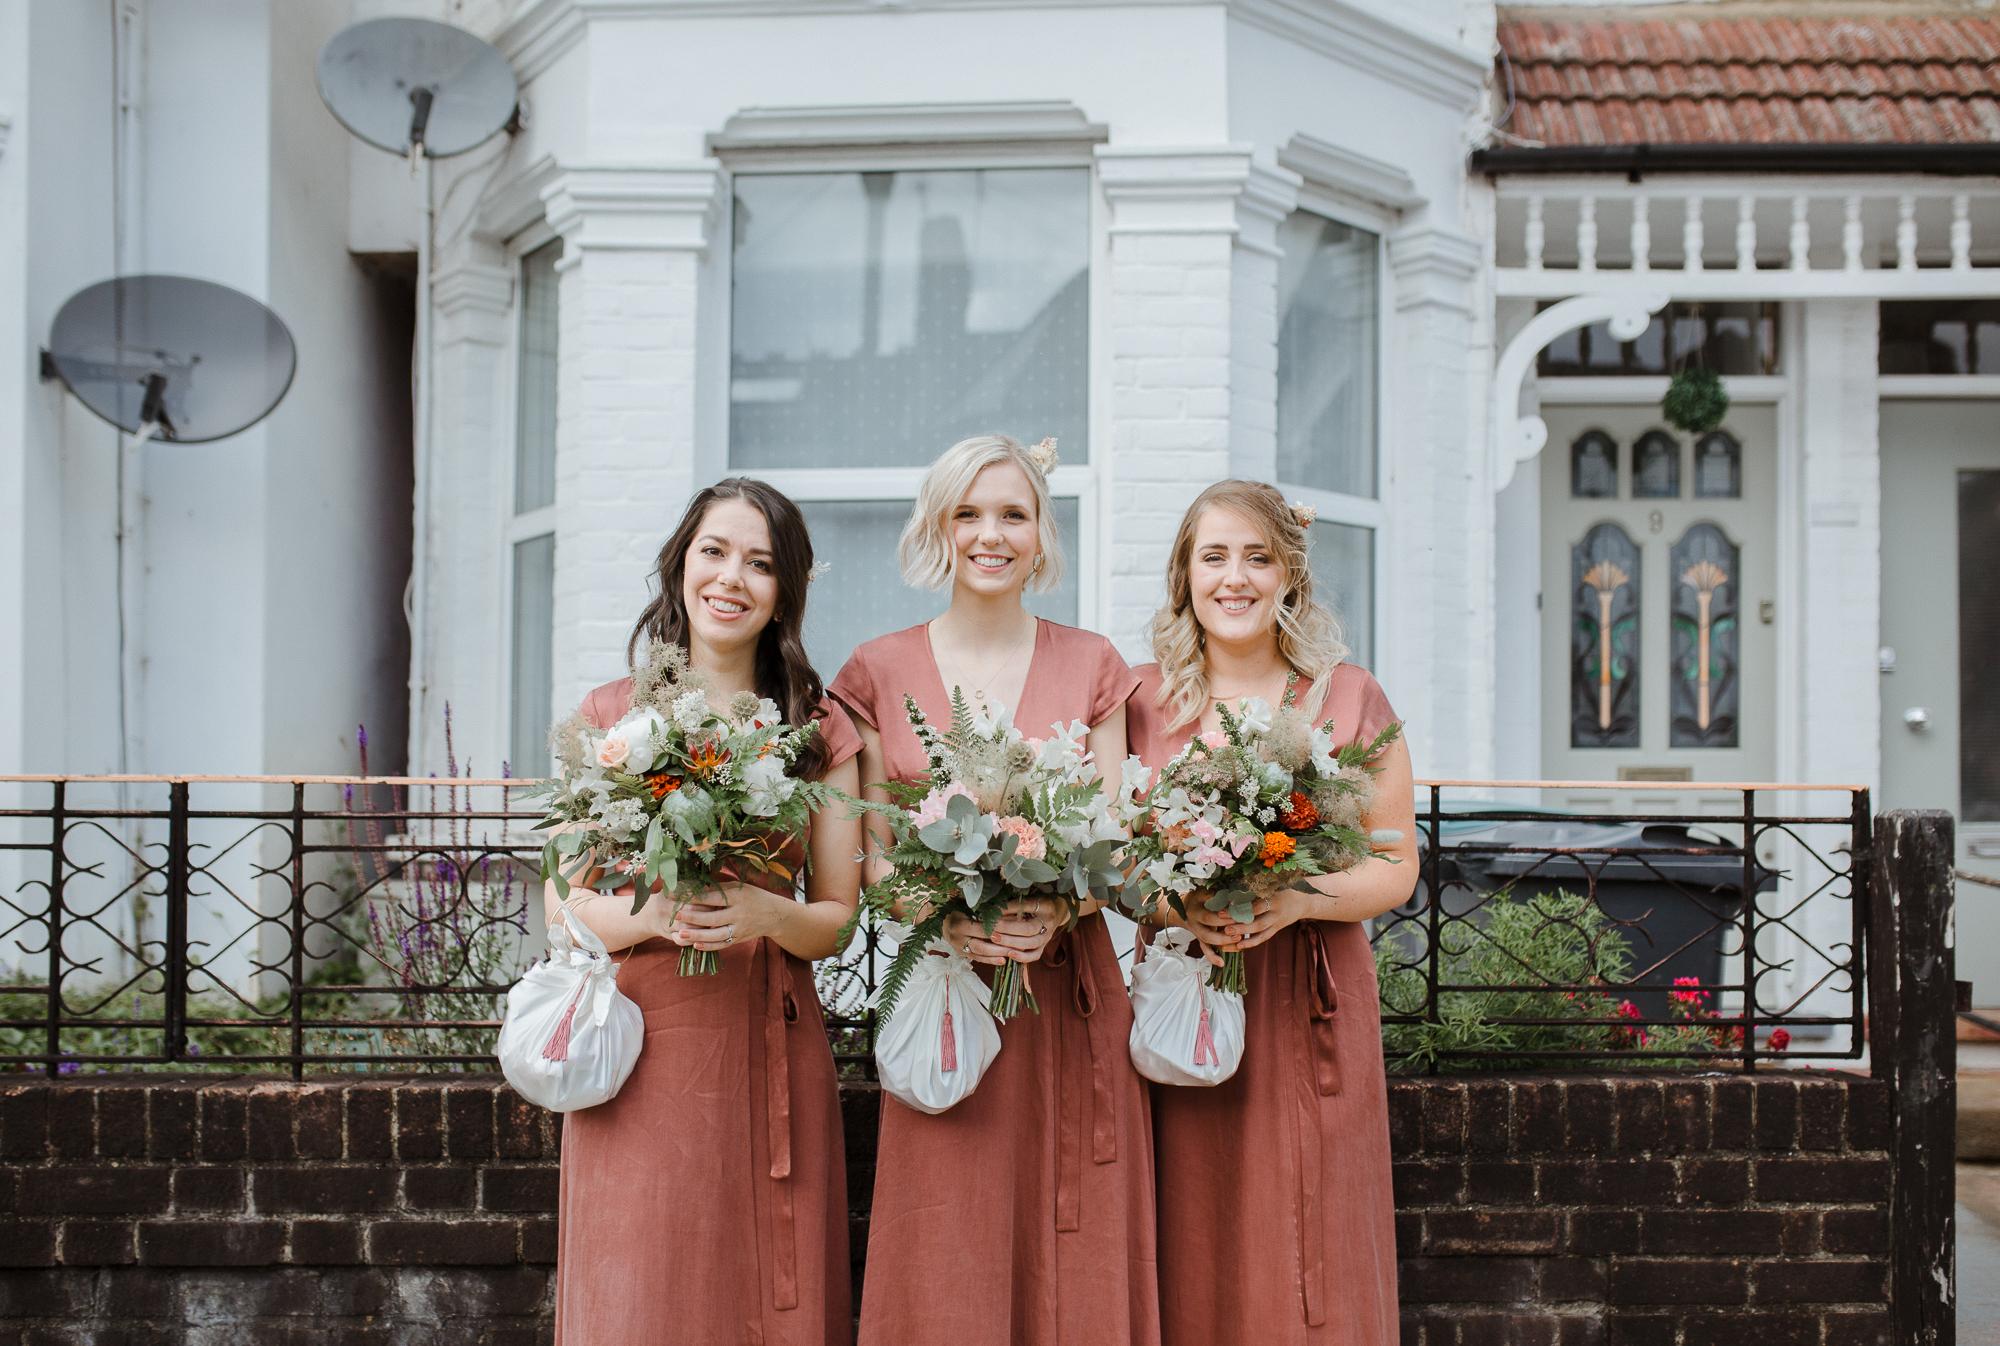 stephanie-green-wedding-photography-sulaflowers-sula-flowers-london-islington-town-hall-depot-n7-53.jpg